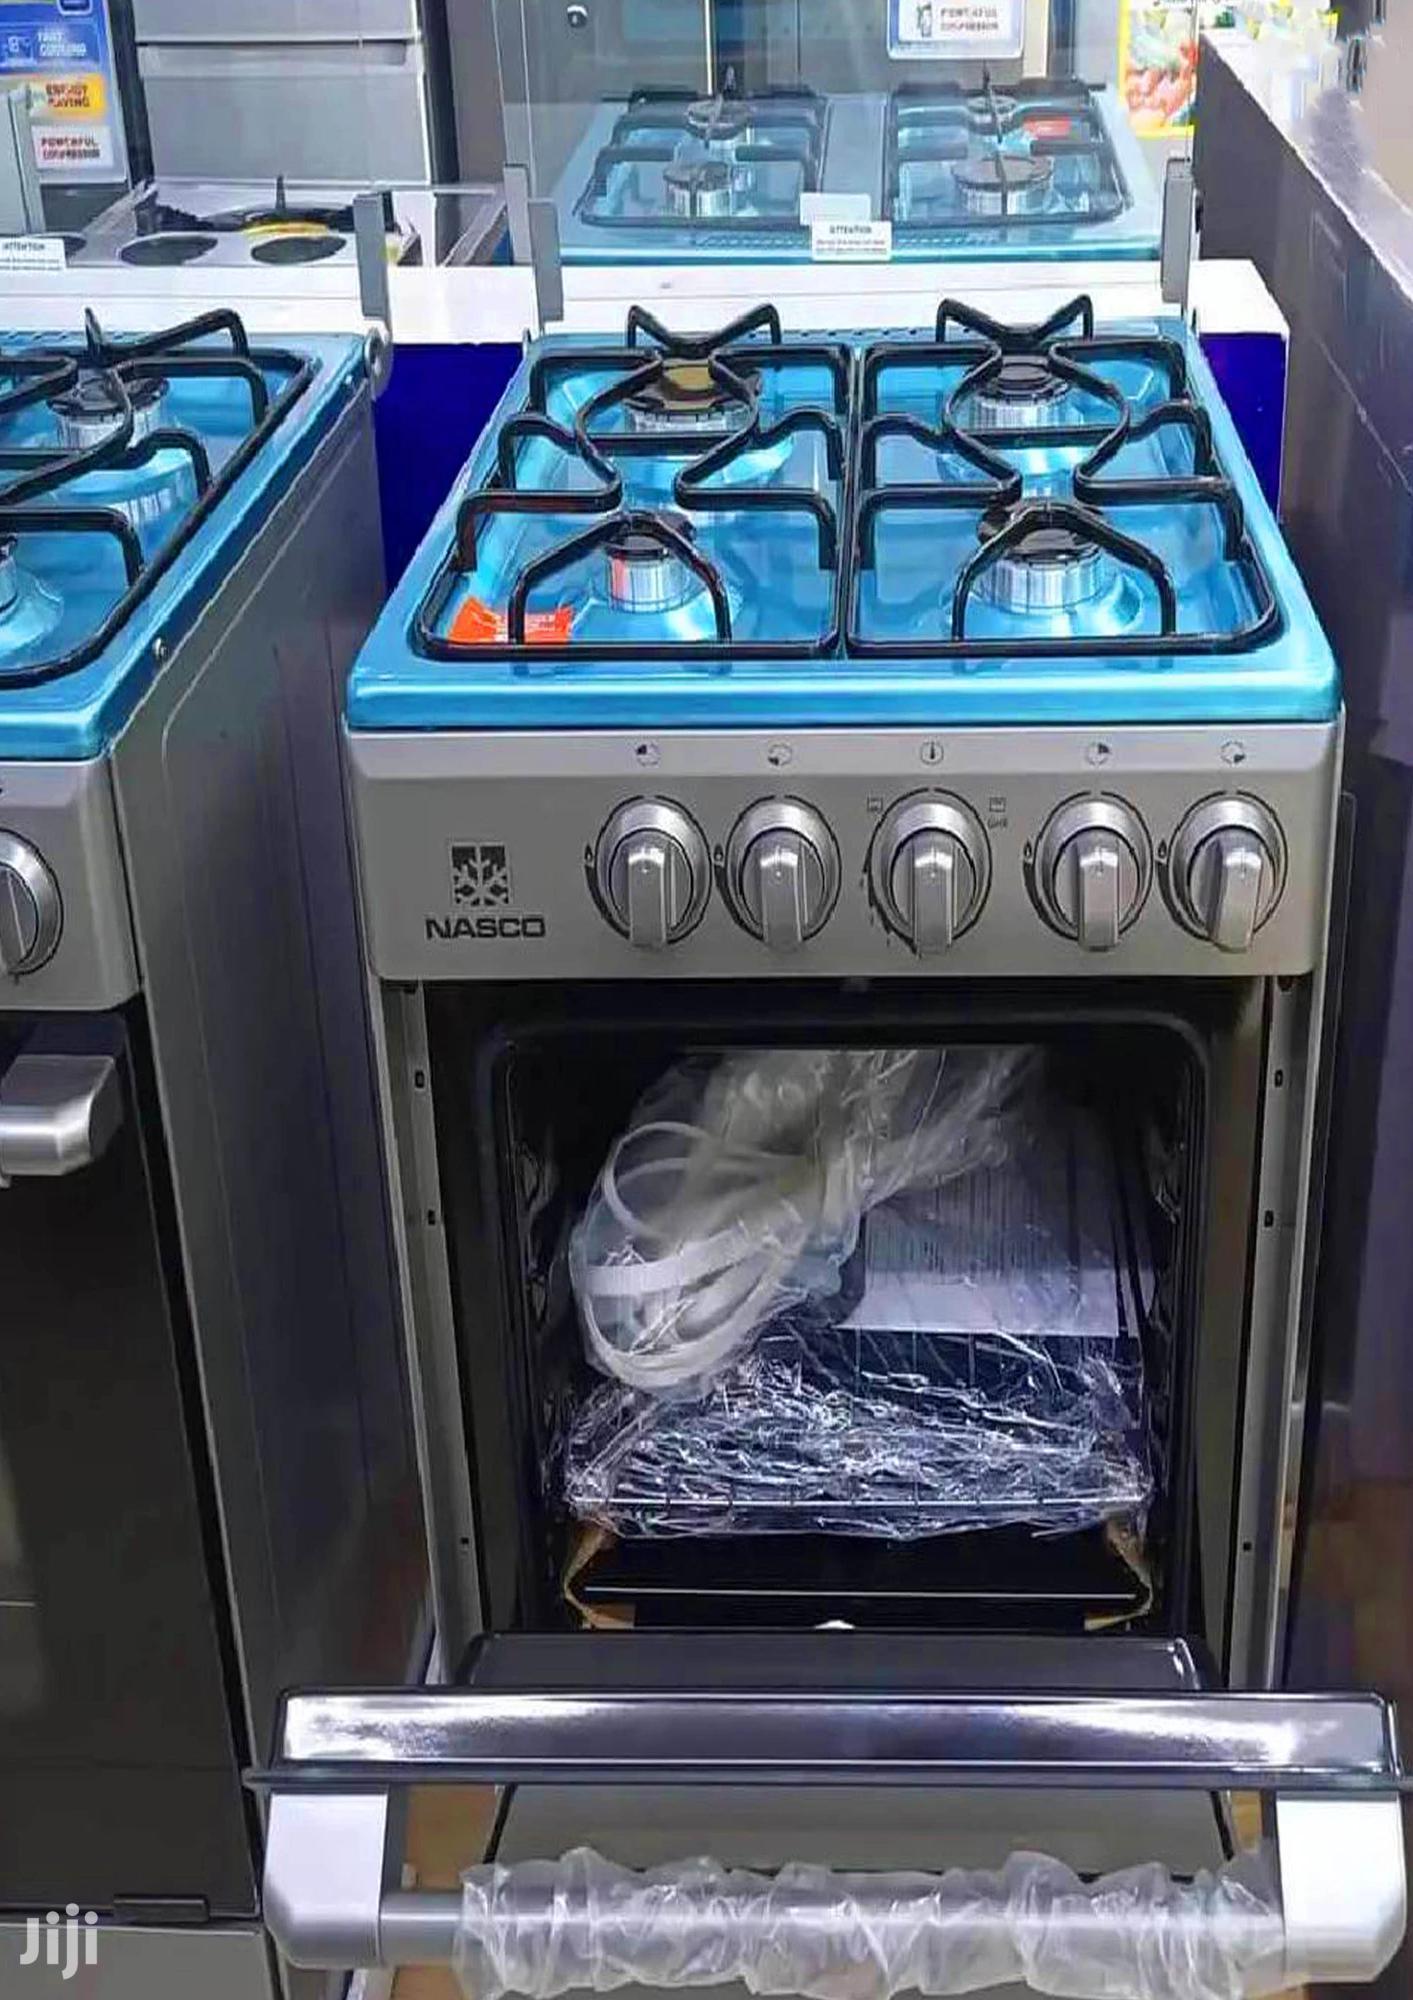 4 Gas Nasco GRILL Cooker Burner